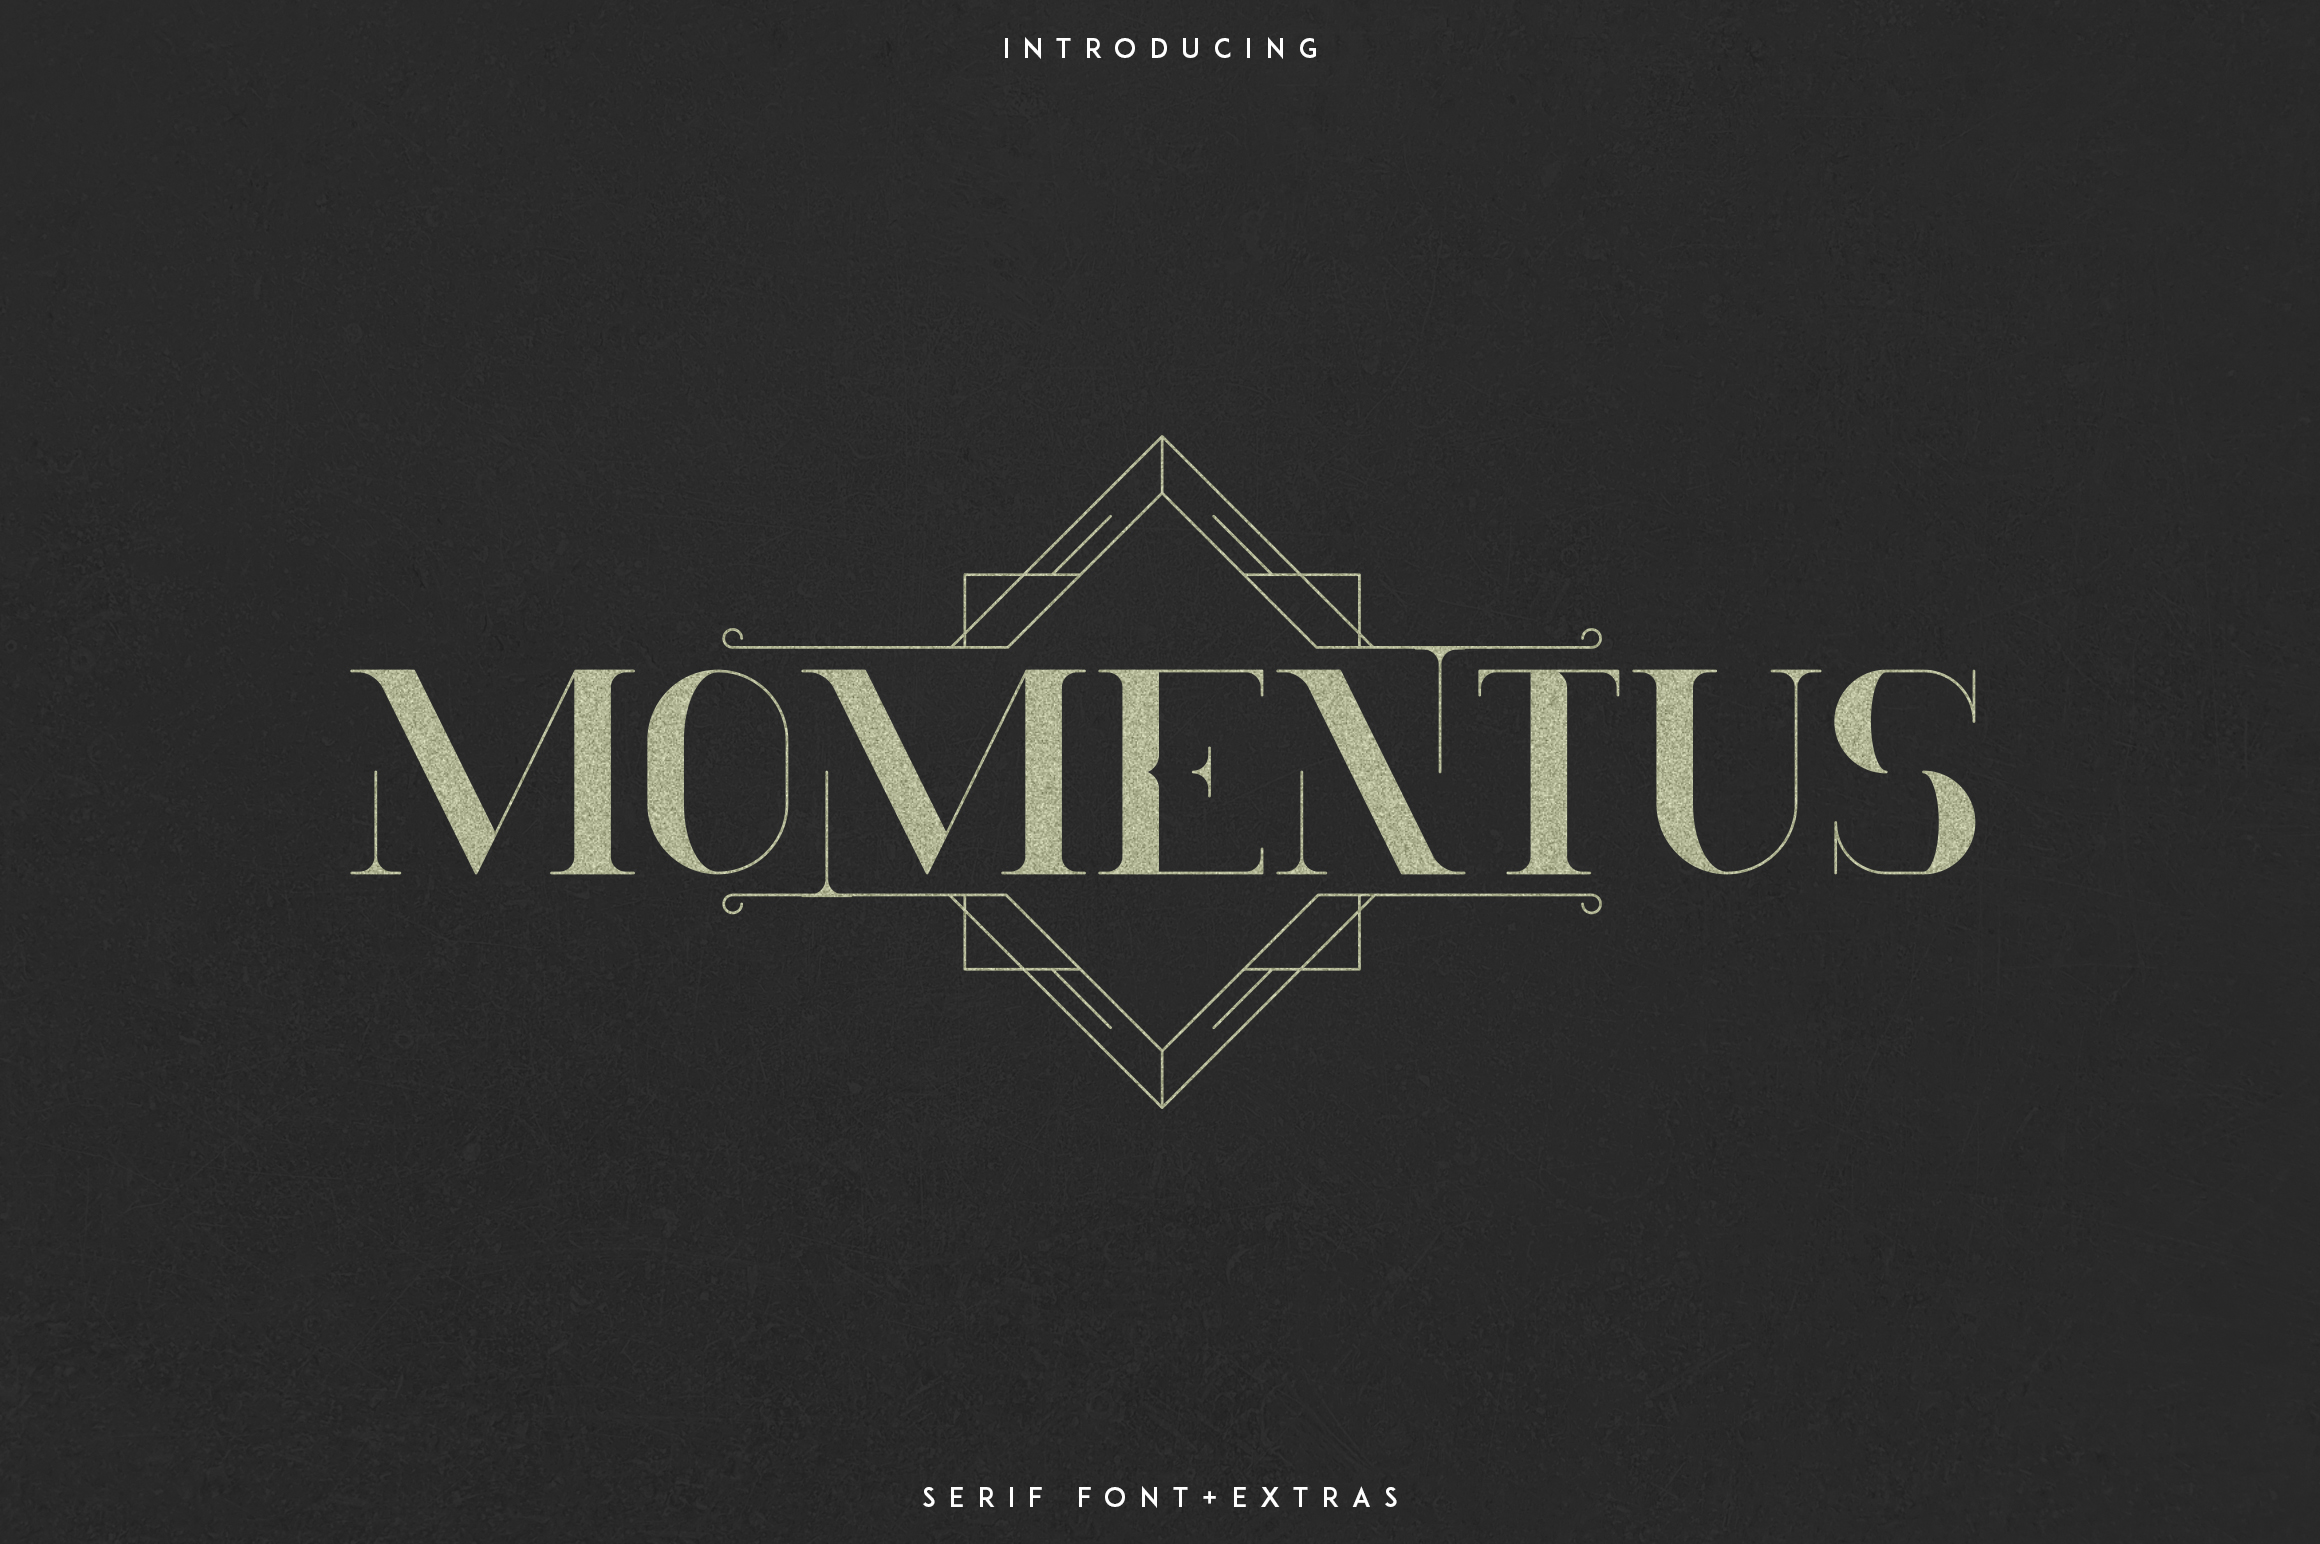 Momentus serif font-Extras example image 1